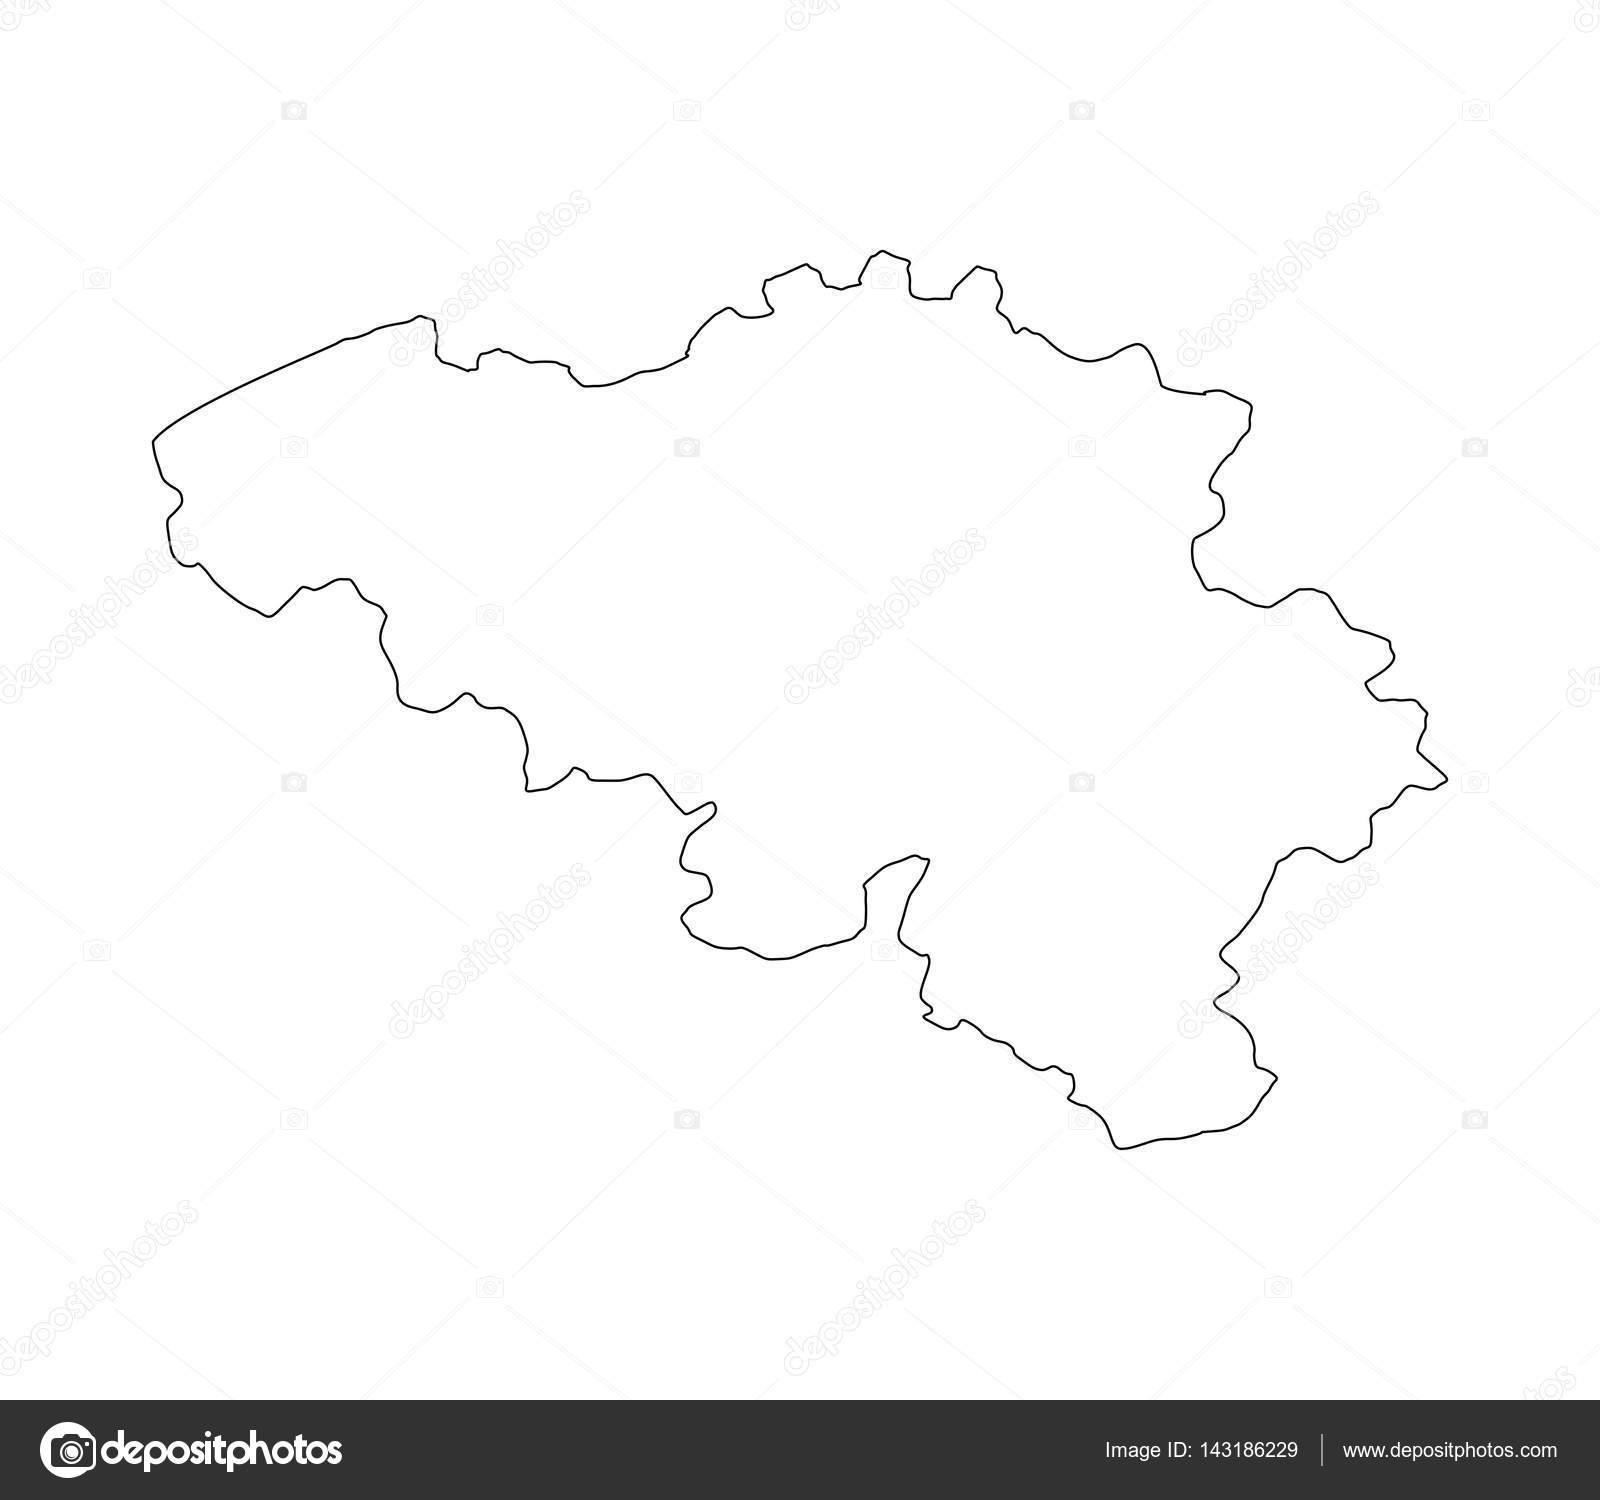 Carte Belgique Noir Et Blanc.Belgium Map Illustrated On A White Background Stock Vector